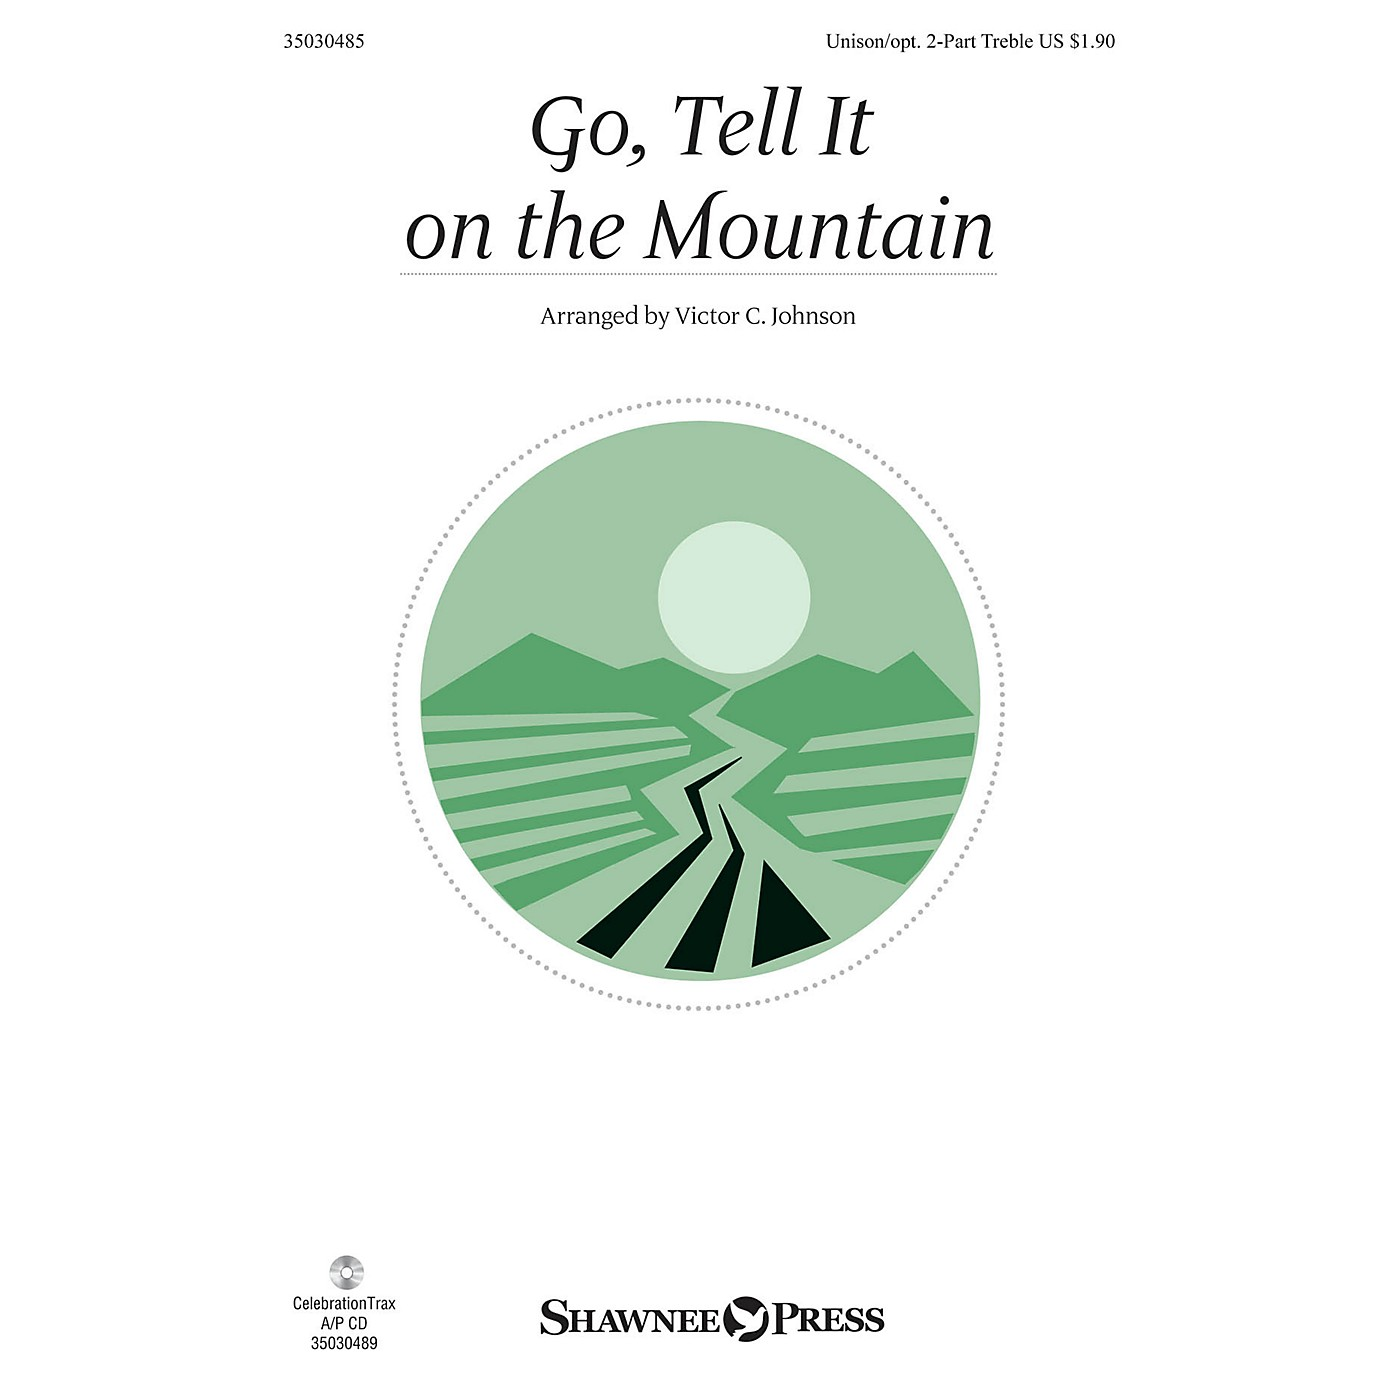 Shawnee Press Go, Tell It on the Mountain Unison/2-Part Treble arranged by Victor Johnson thumbnail